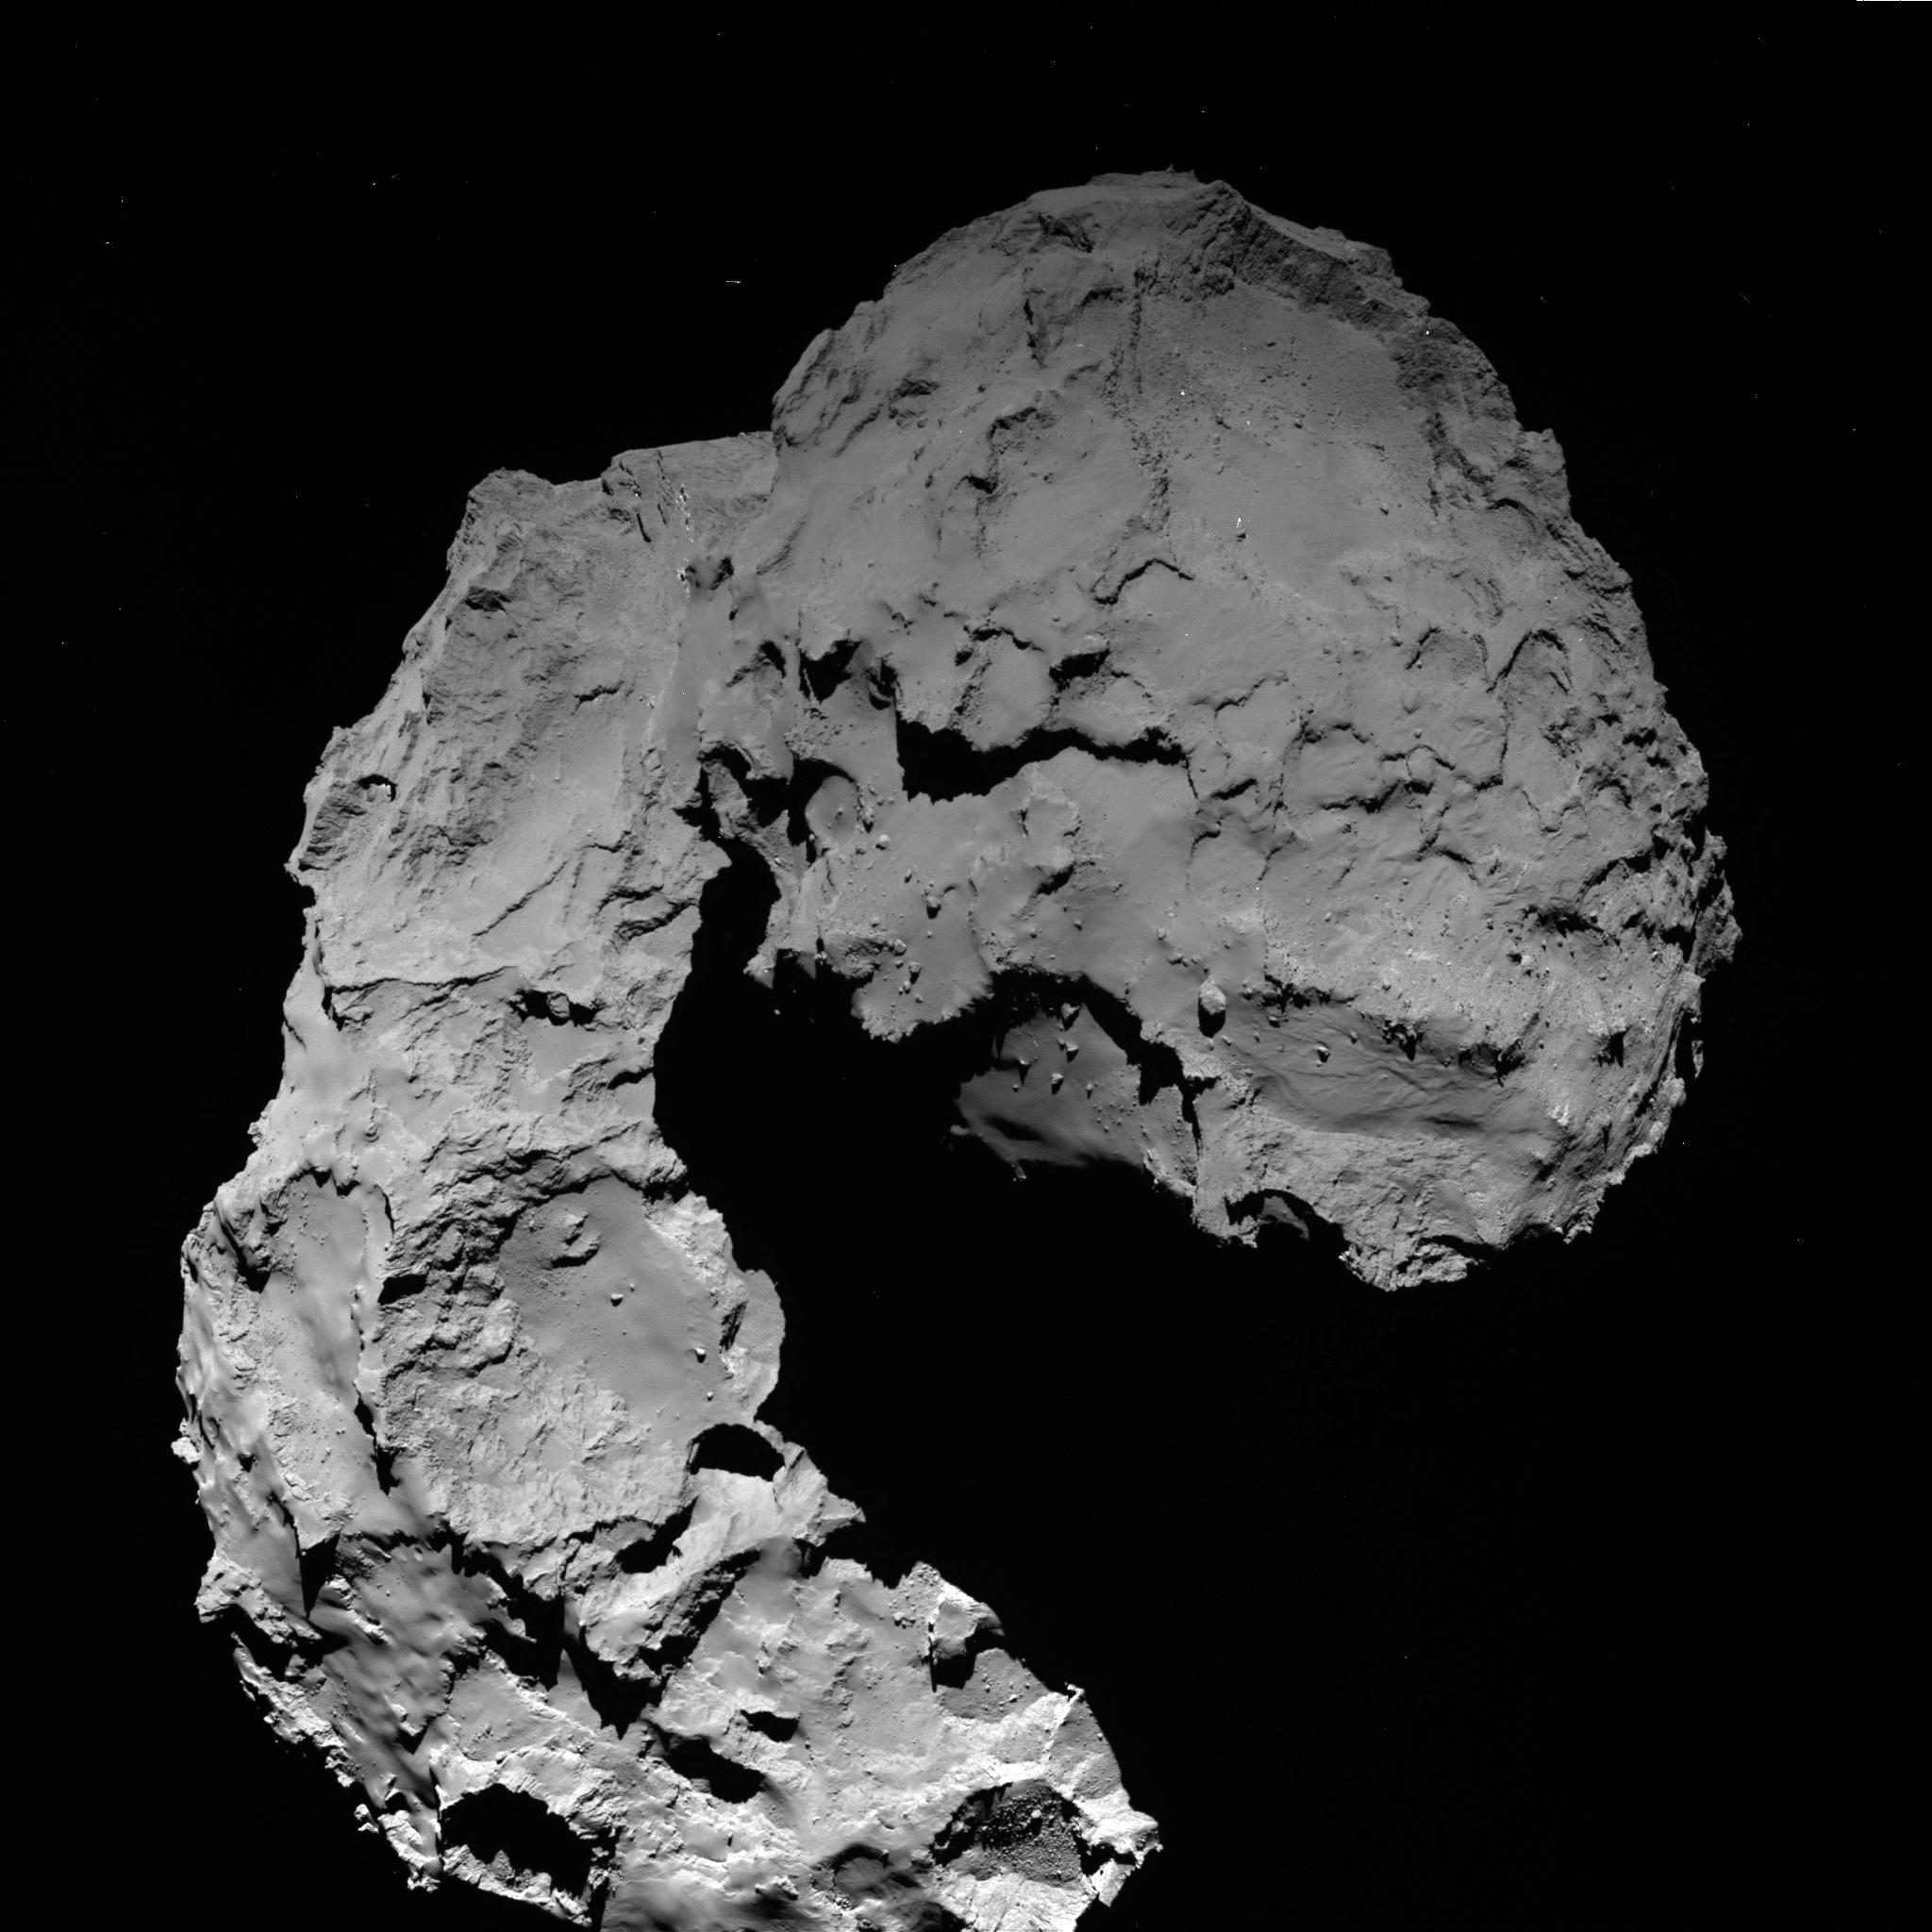 http://www.nasa.gov/sites/default/files/thumbnails/image/comet_on_29_september_2016_osiris_wide-angle_camera.jpg